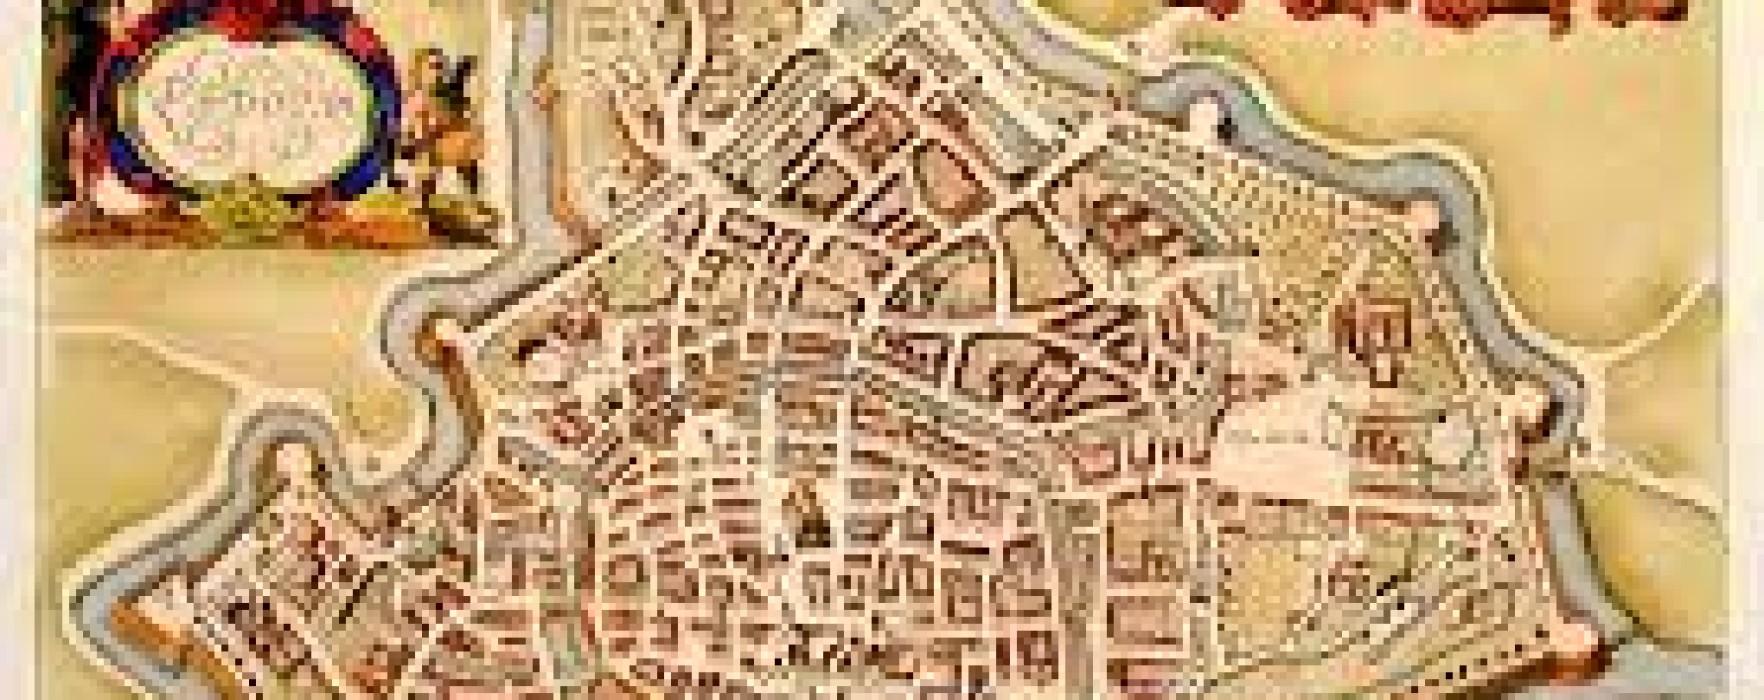 Zona Industriale Padova: si conclude un'epoca.